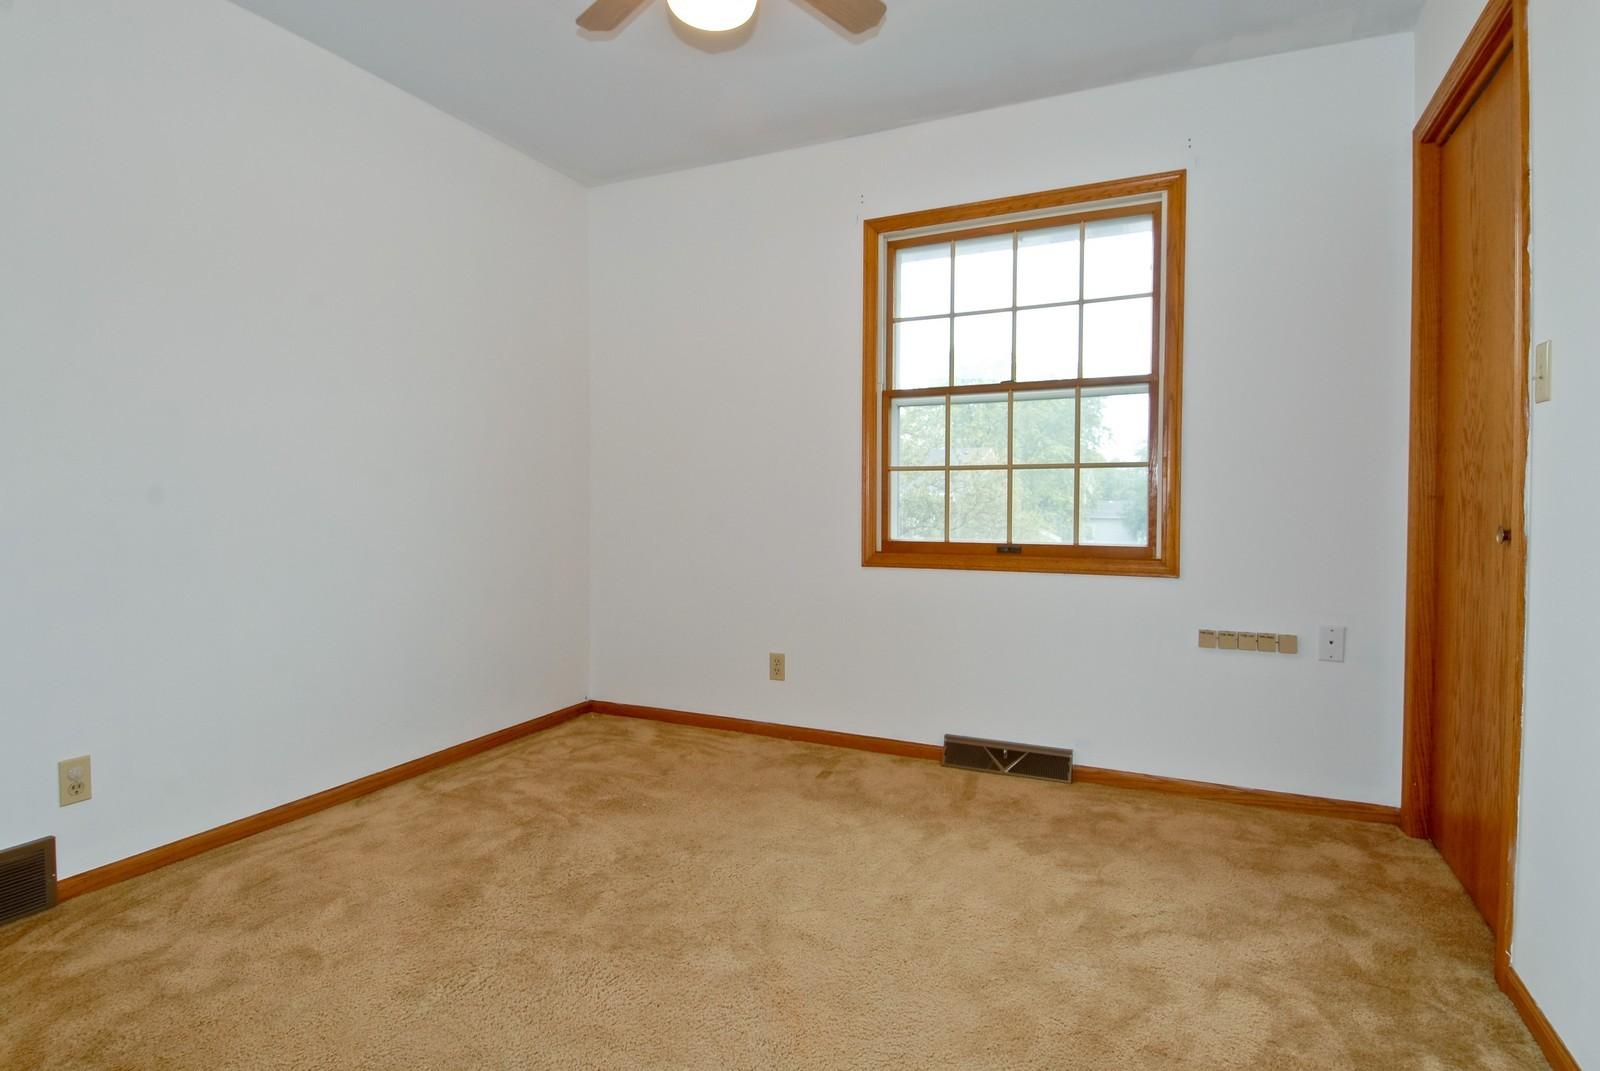 Real Estate Photography - 210 Pardridge Pl, Dekalb, IL, 60115 - 3rd Bedroom